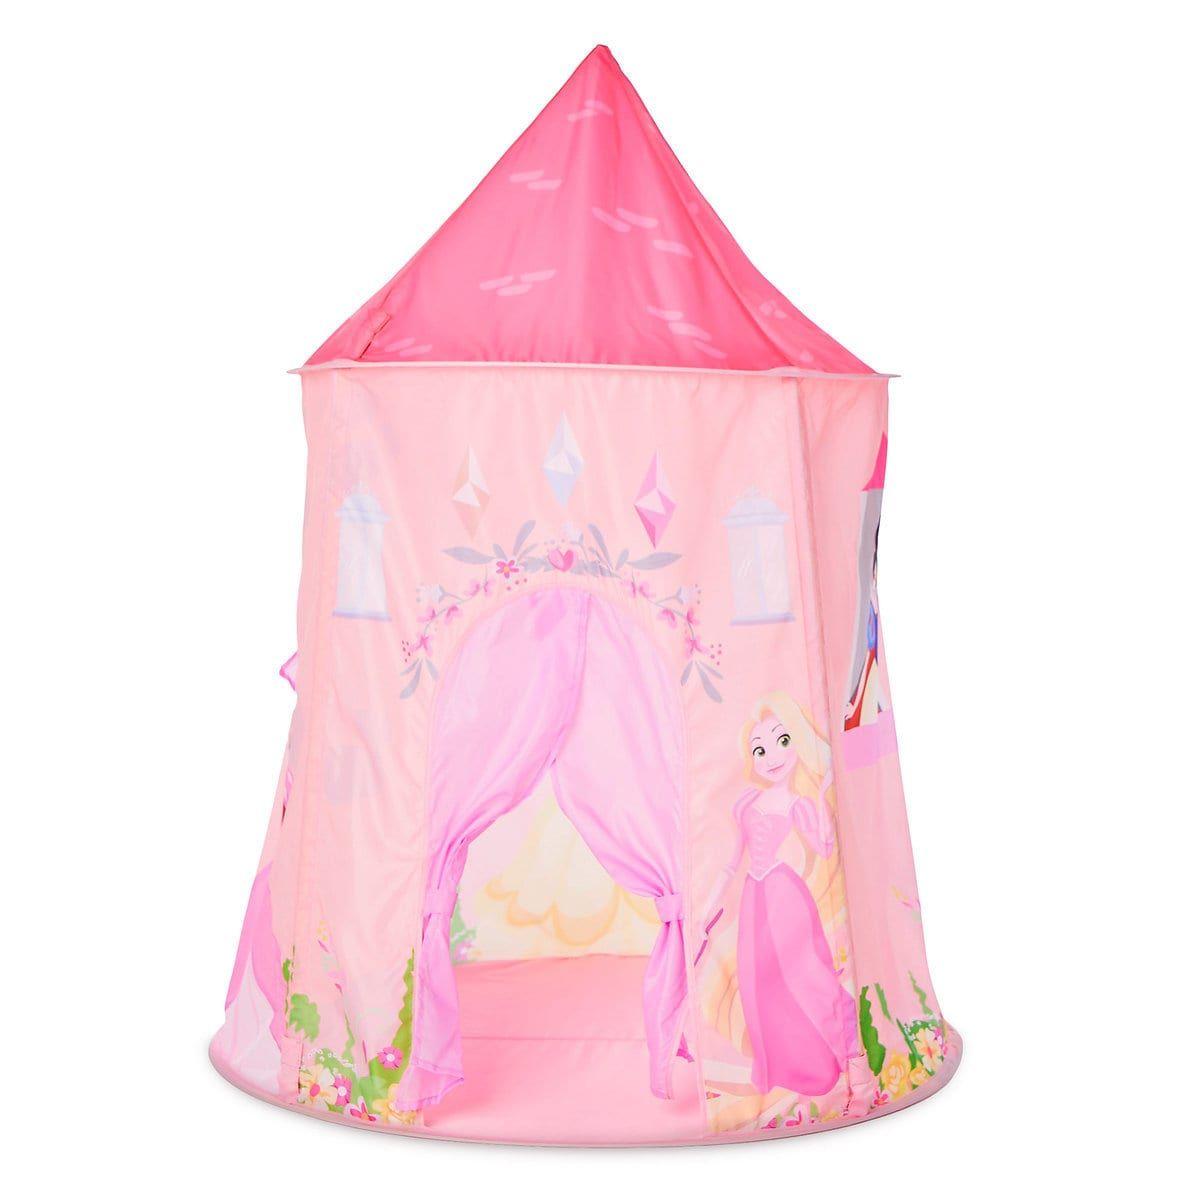 Disney Princess Castle Play Tent for Kids  sc 1 st  Pinterest & Disney Princess Castle Play Tent for Kids | Toys | Disney princess ...